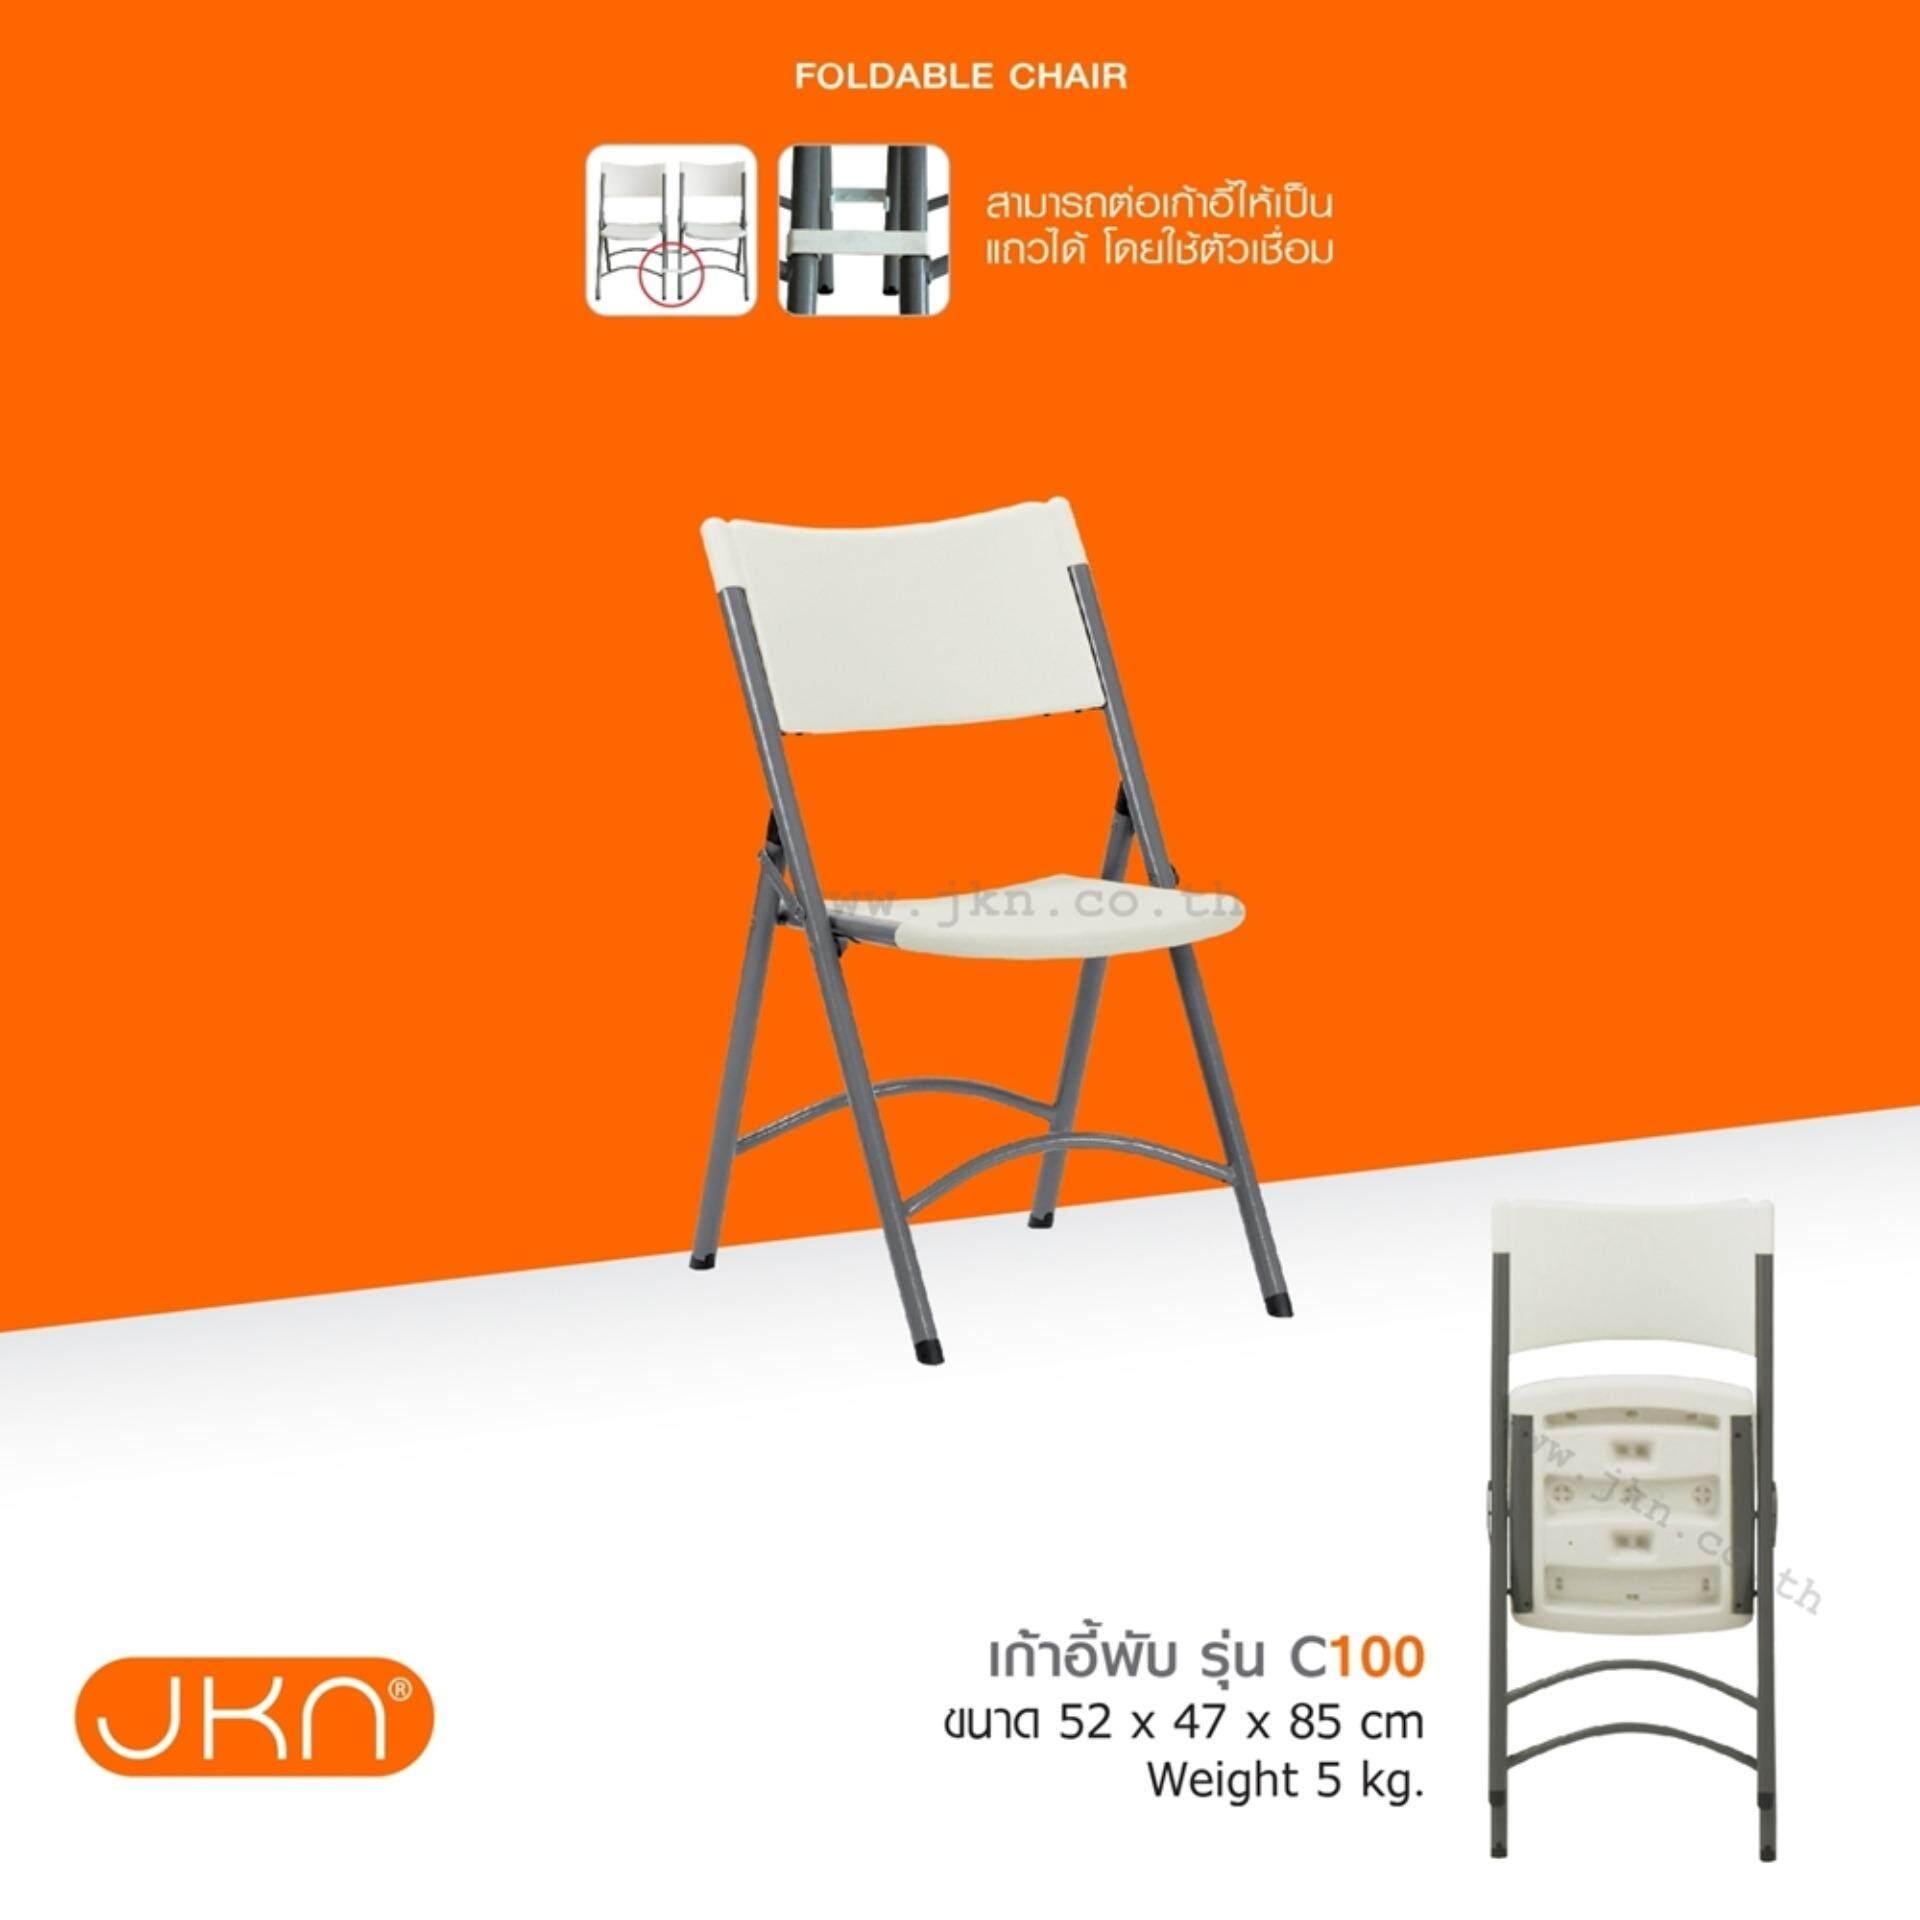 Jkn เก้าอี้พับอเนกประสงค์ รุ่น C-100 (กล่องบรรจุ 4 ตัว) By Mc Plus.